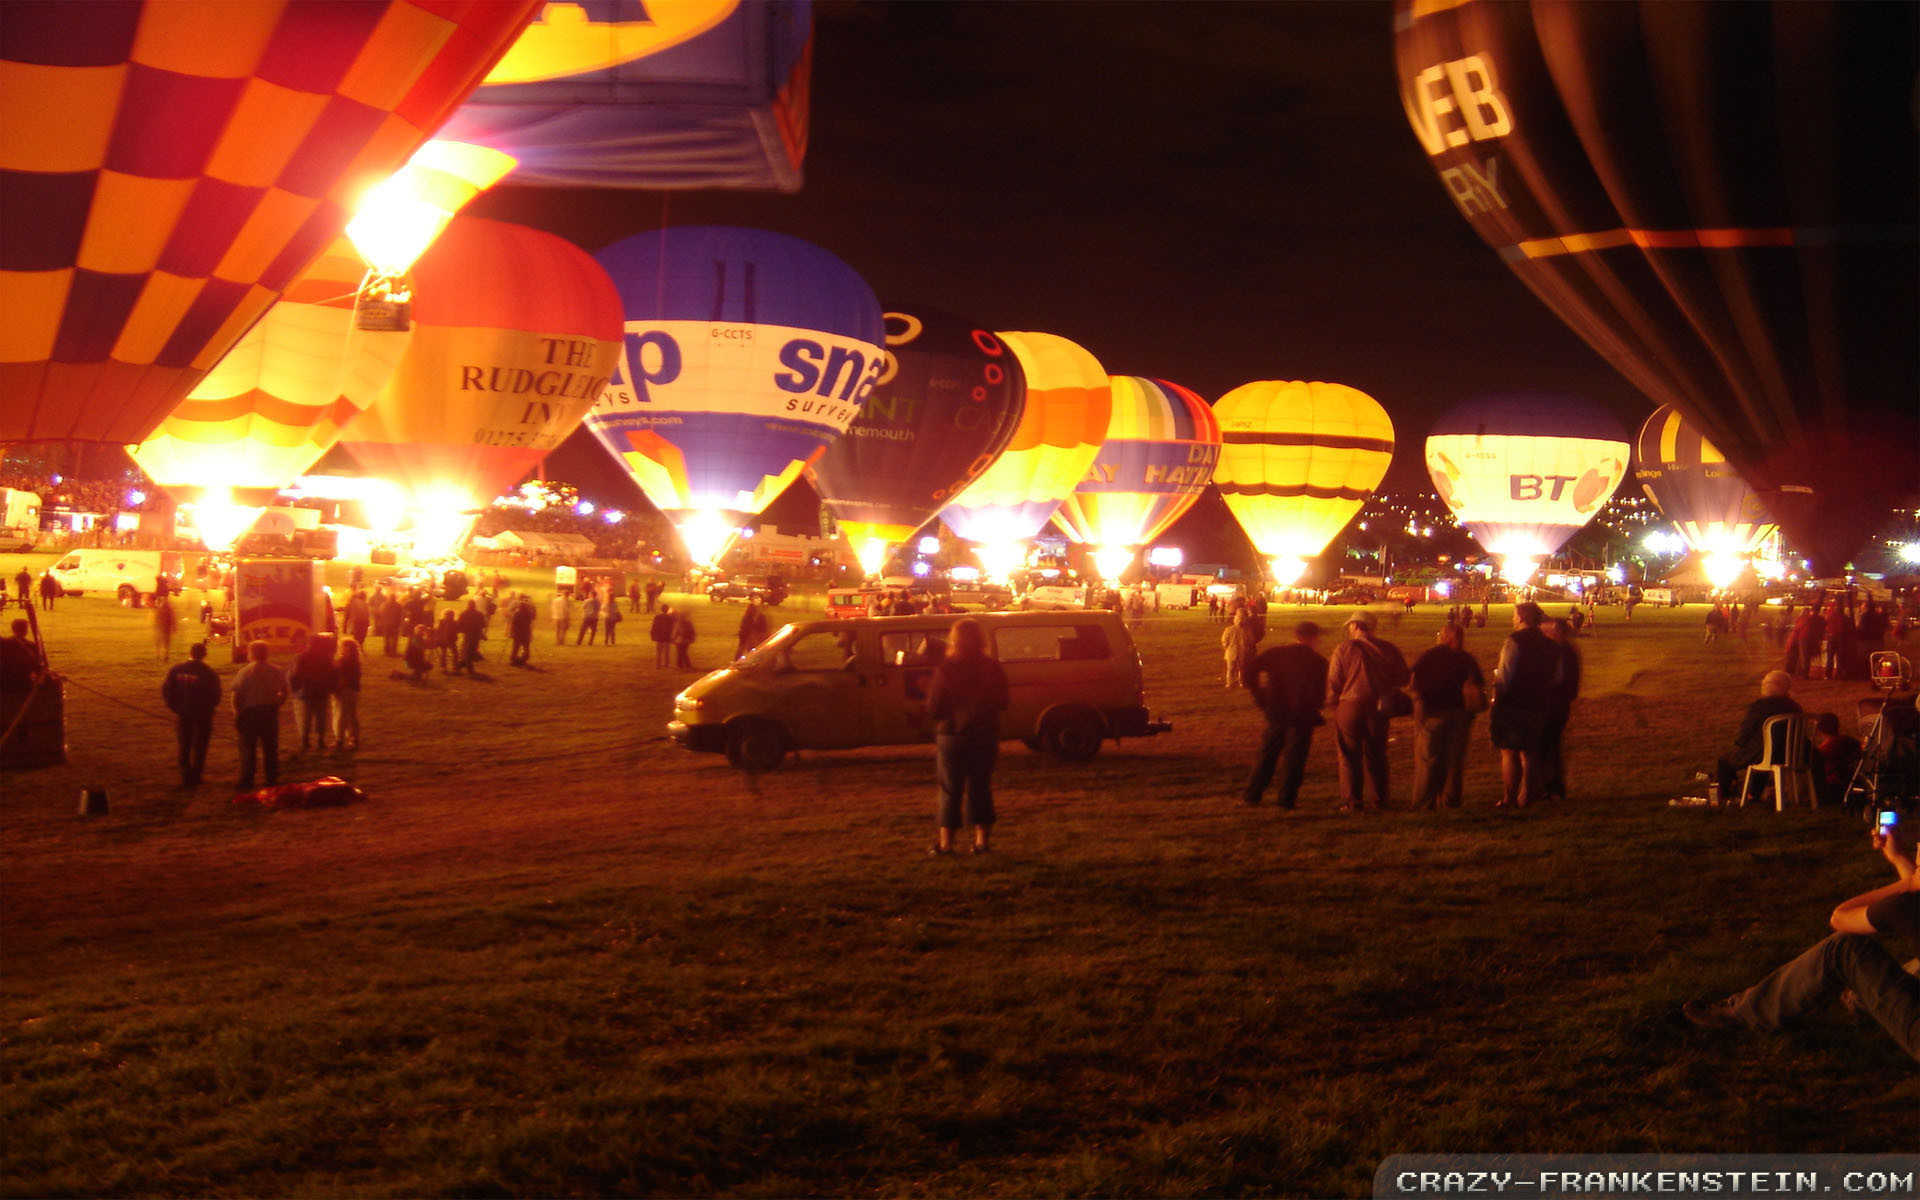 Res: 1920x1200, Wallpaper: Bristol balloon fiesta. Resolution: 1024x768 | 1280x1024 |  1600x1200. Widescreen Res: 1440x900 | 1680x1050 |